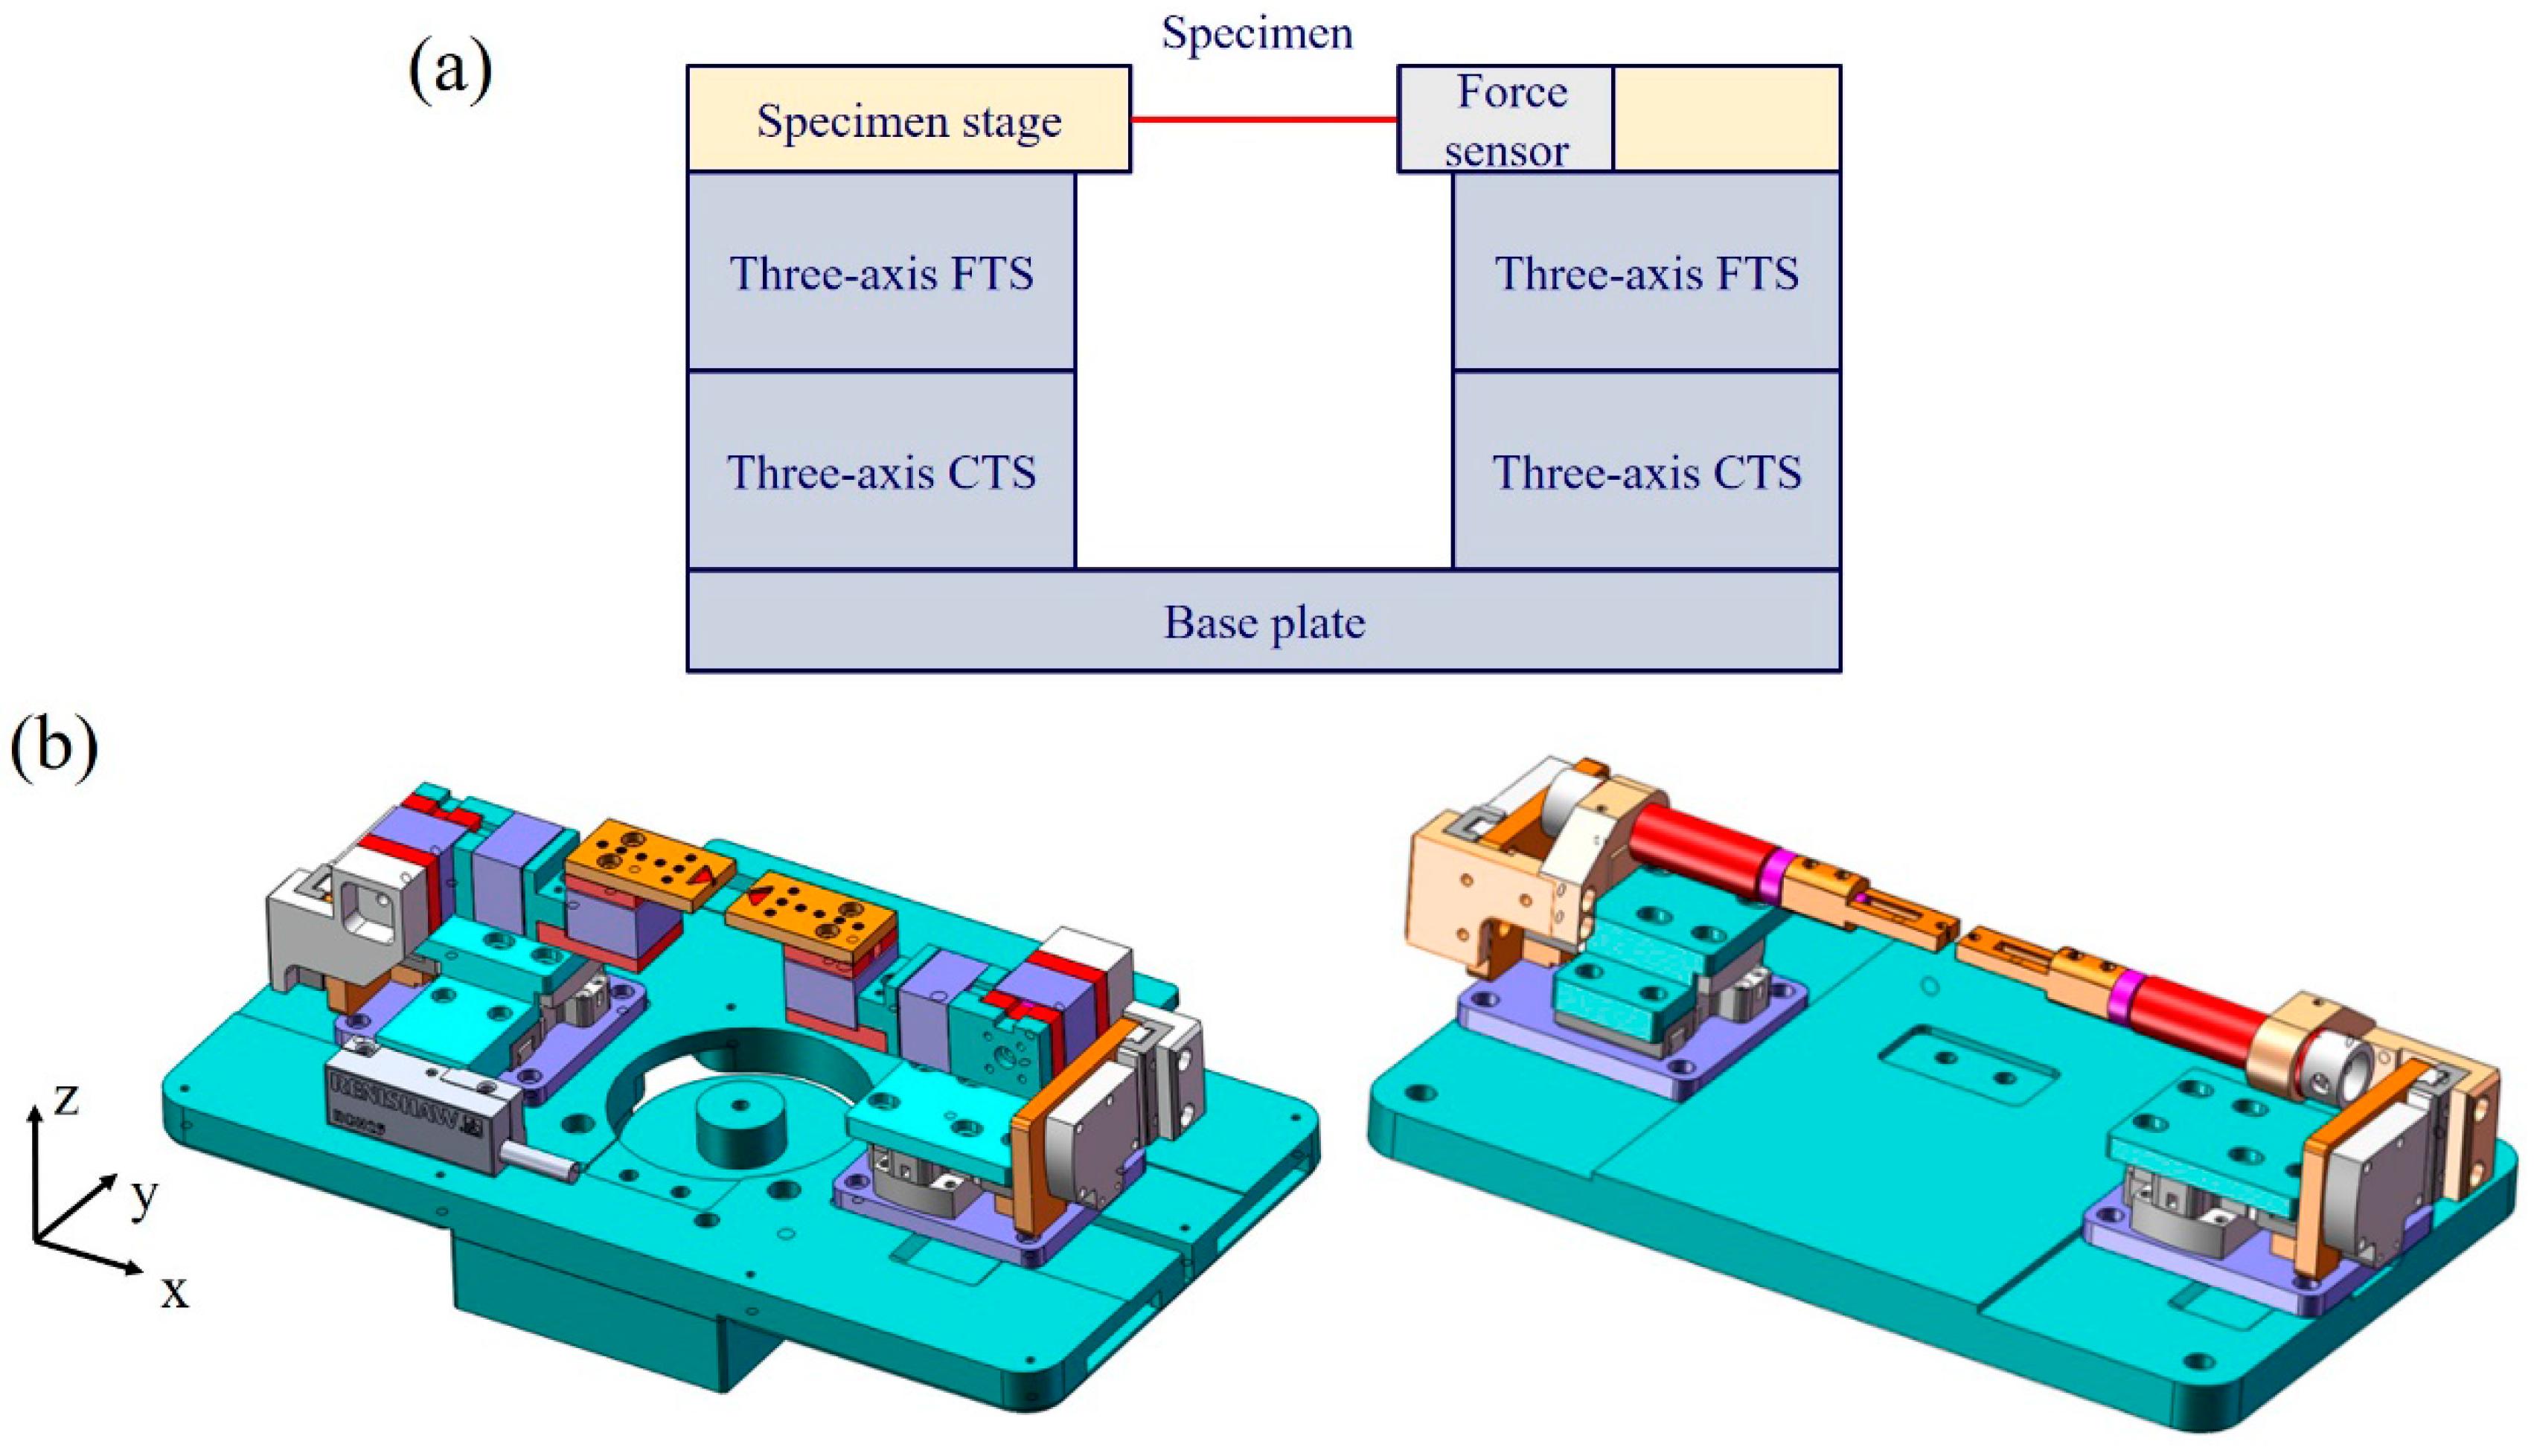 Saturn Vue Cvtautomatic Transmission 03 2 2l Opt L61 Fwd G Force Chips Wiring Diagram Gforce Performance 00 Taurus 3 0l